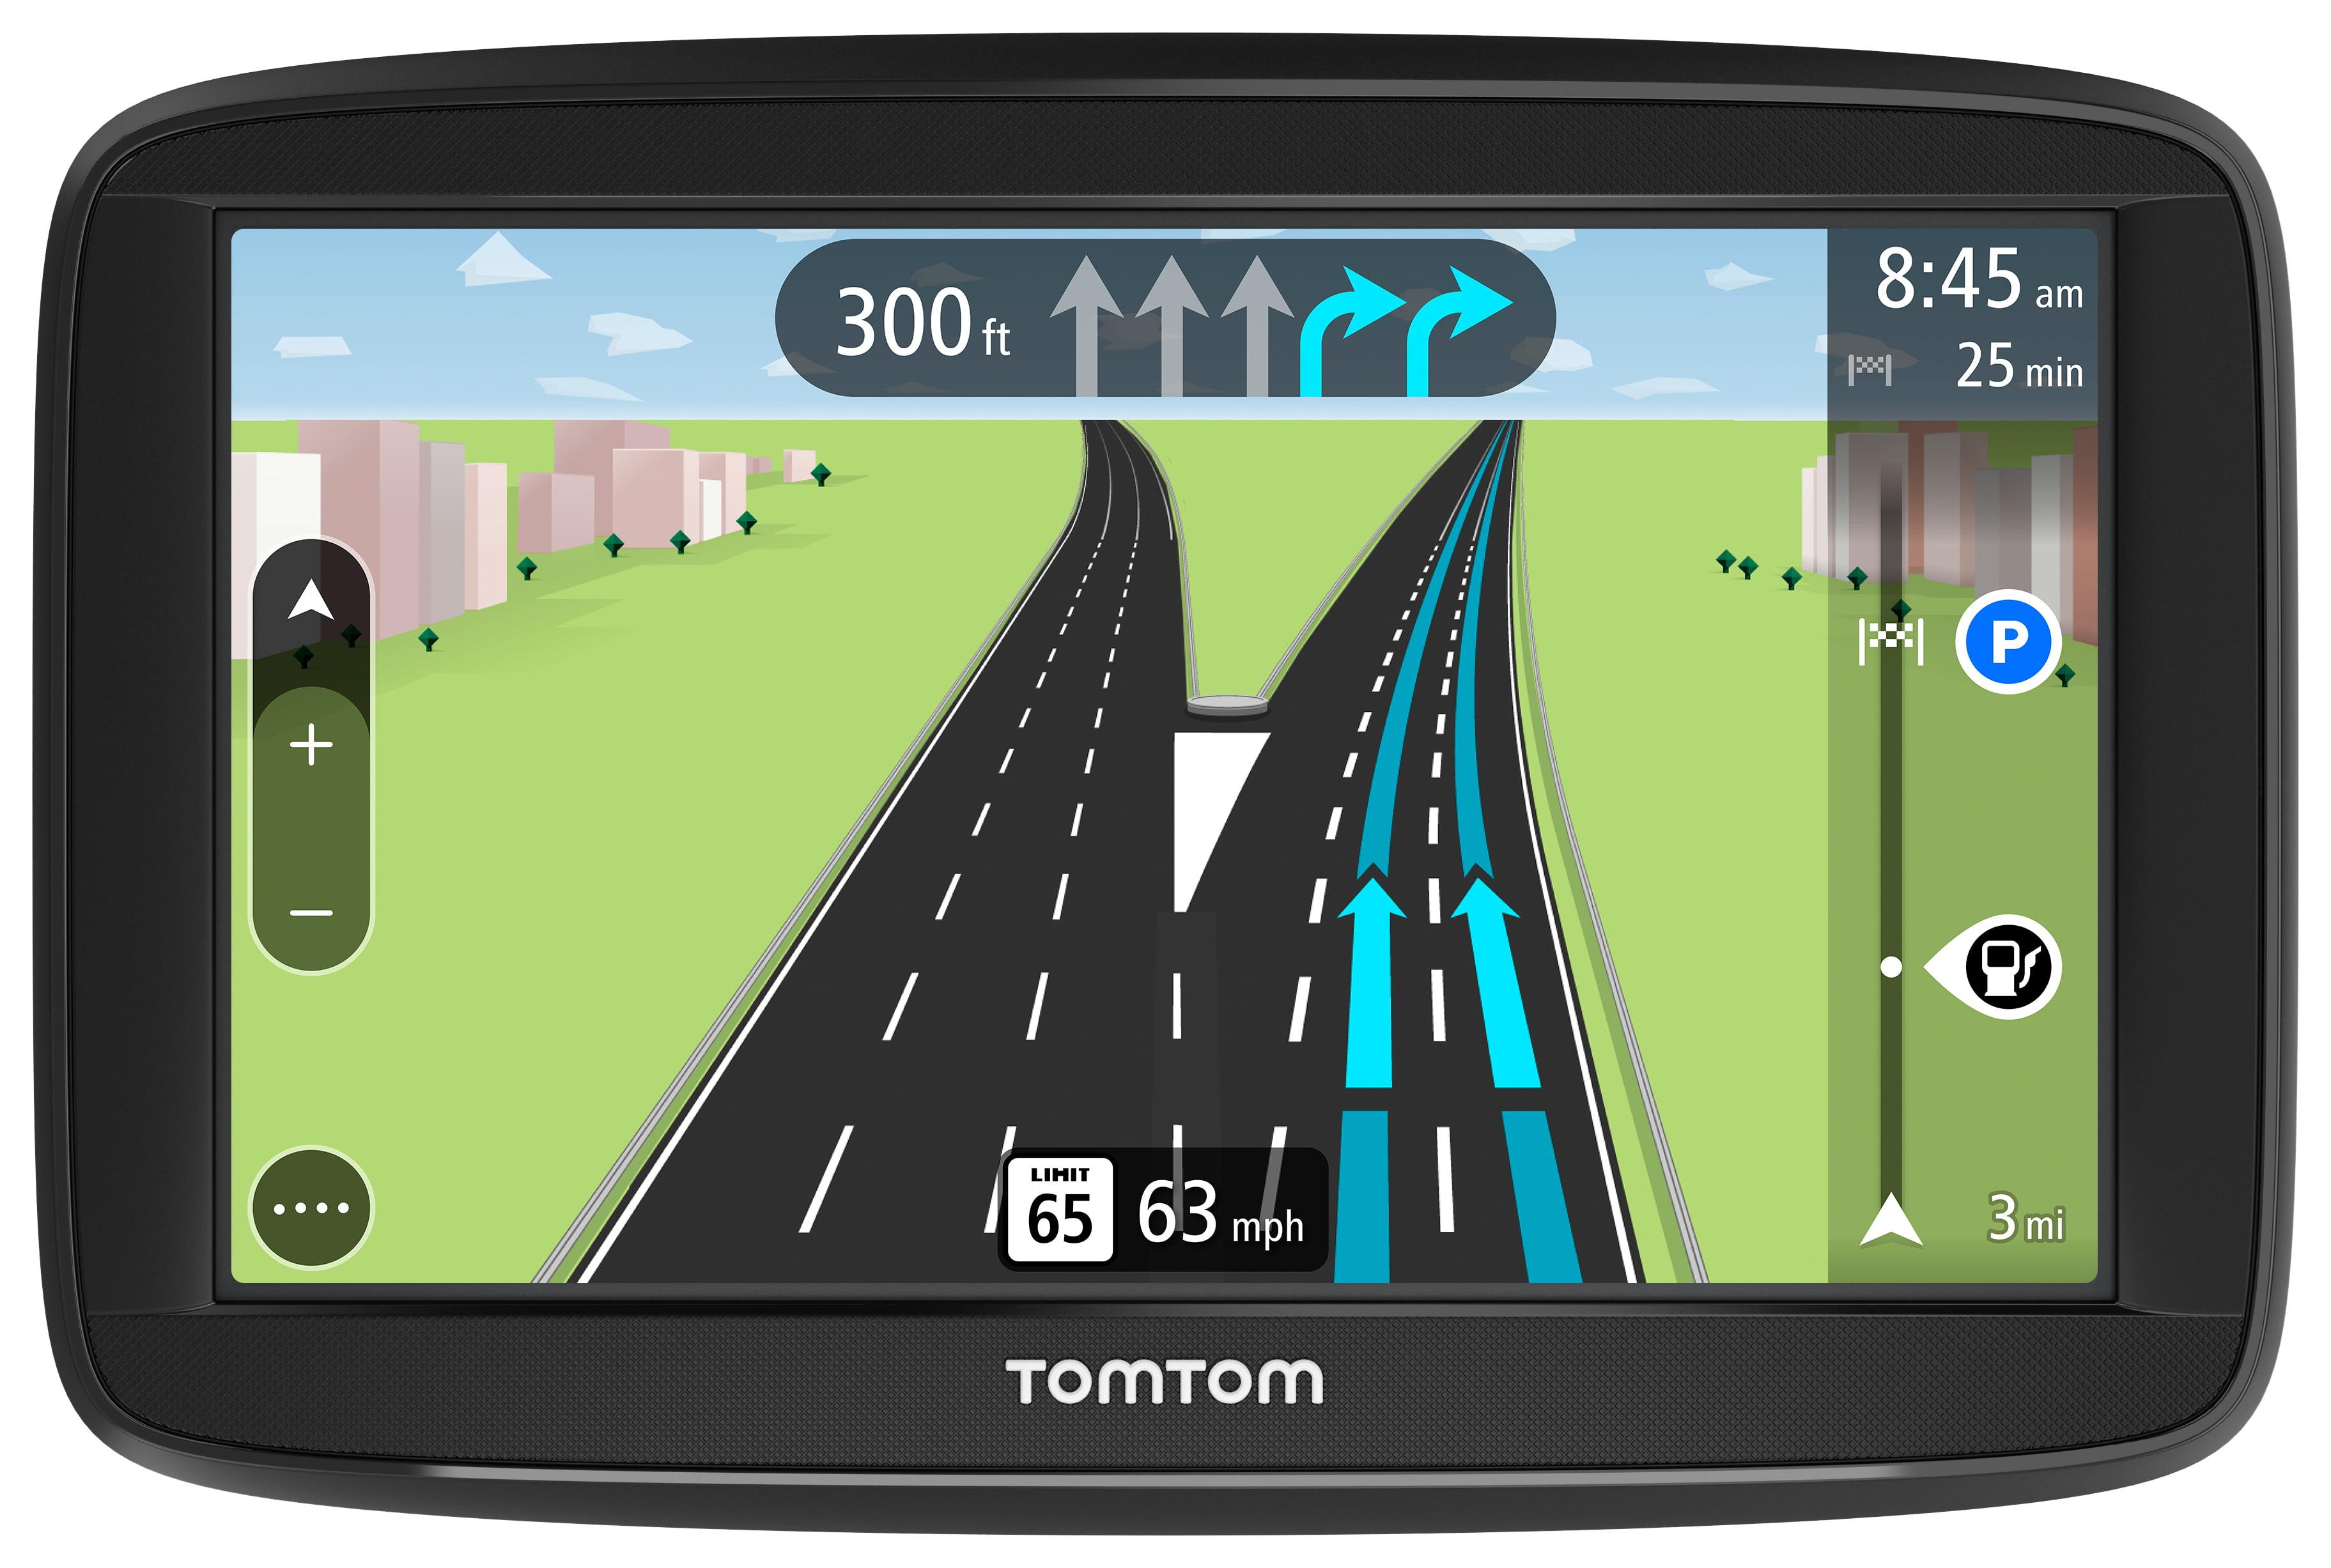 TomTom Via 1625M LM GPS by TomTom